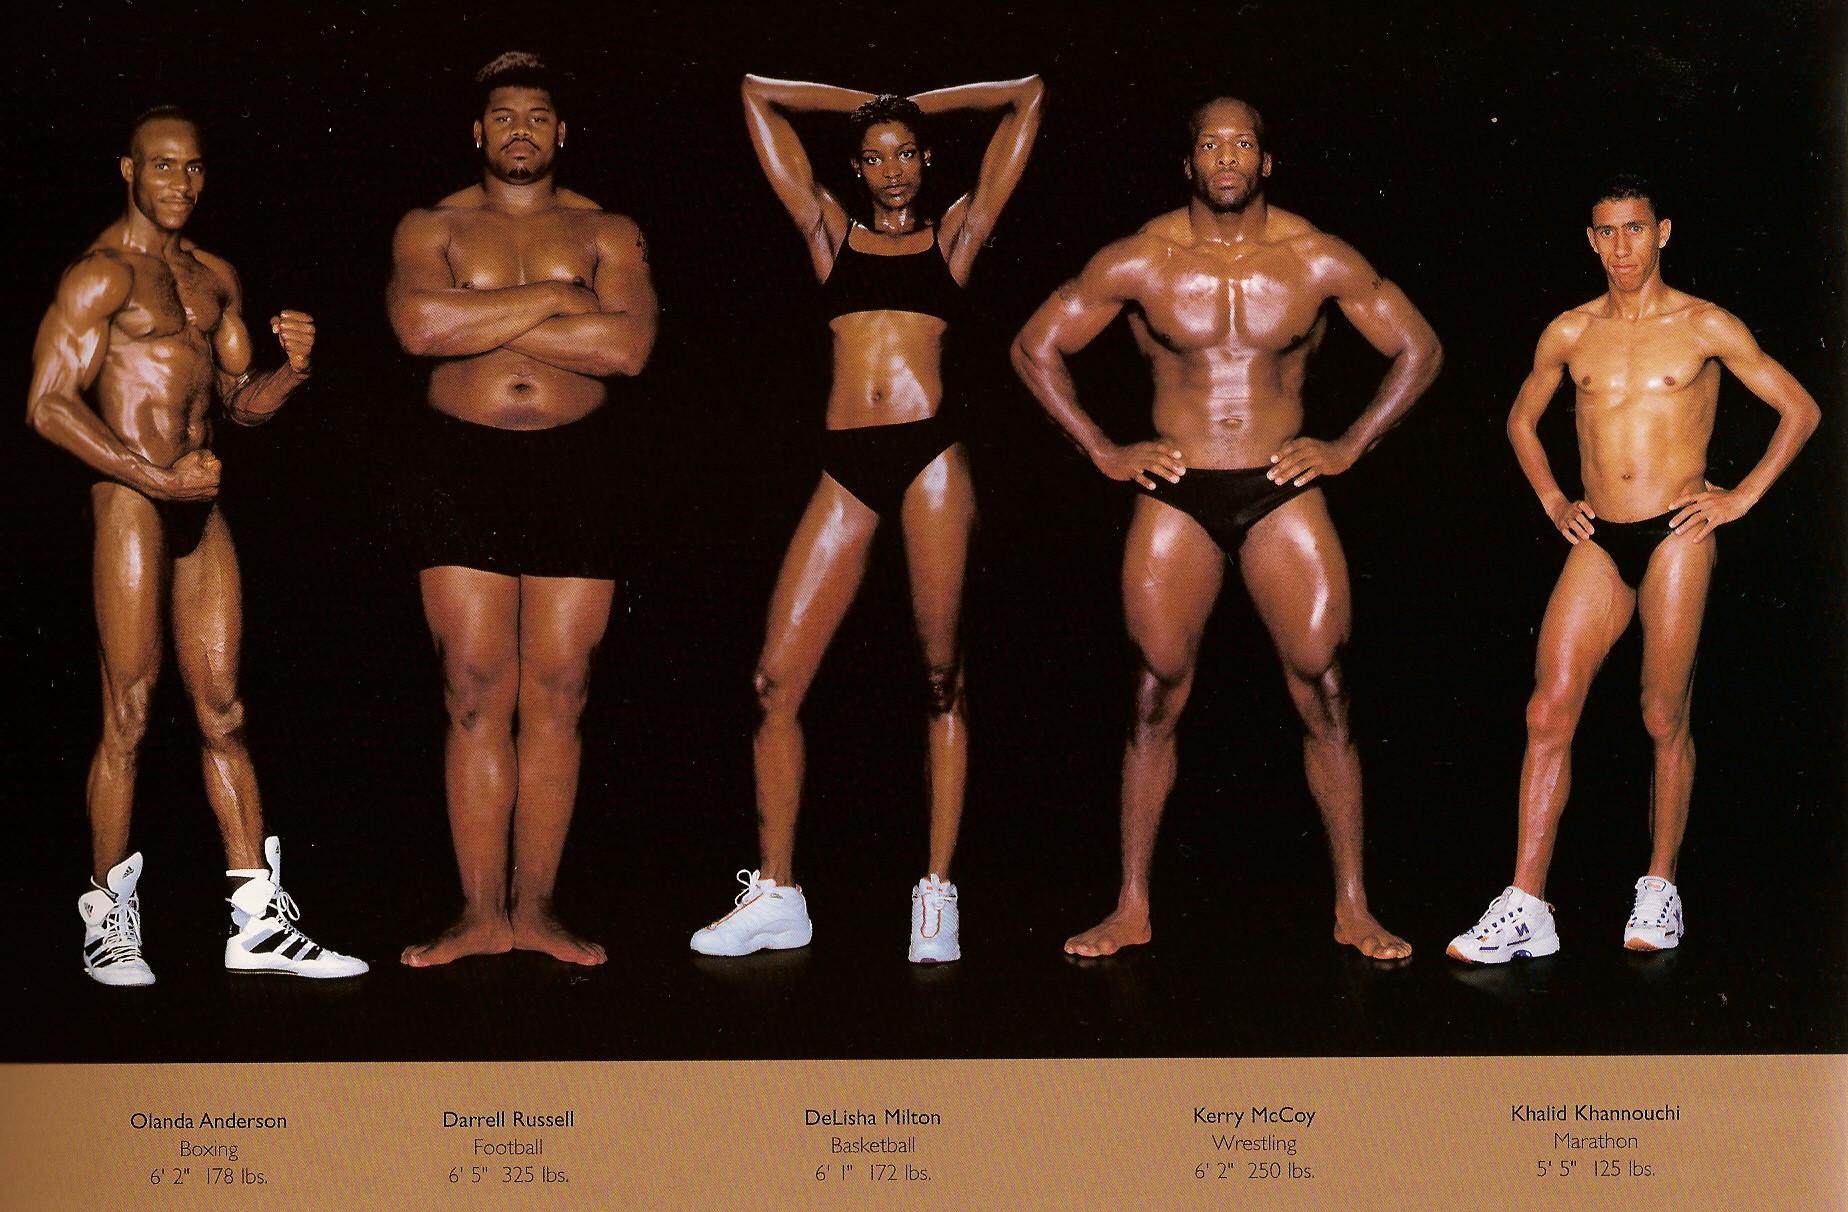 Howard Schatz / слева направо: бокс, футбол, баскетбол, реслинг, марафоны.